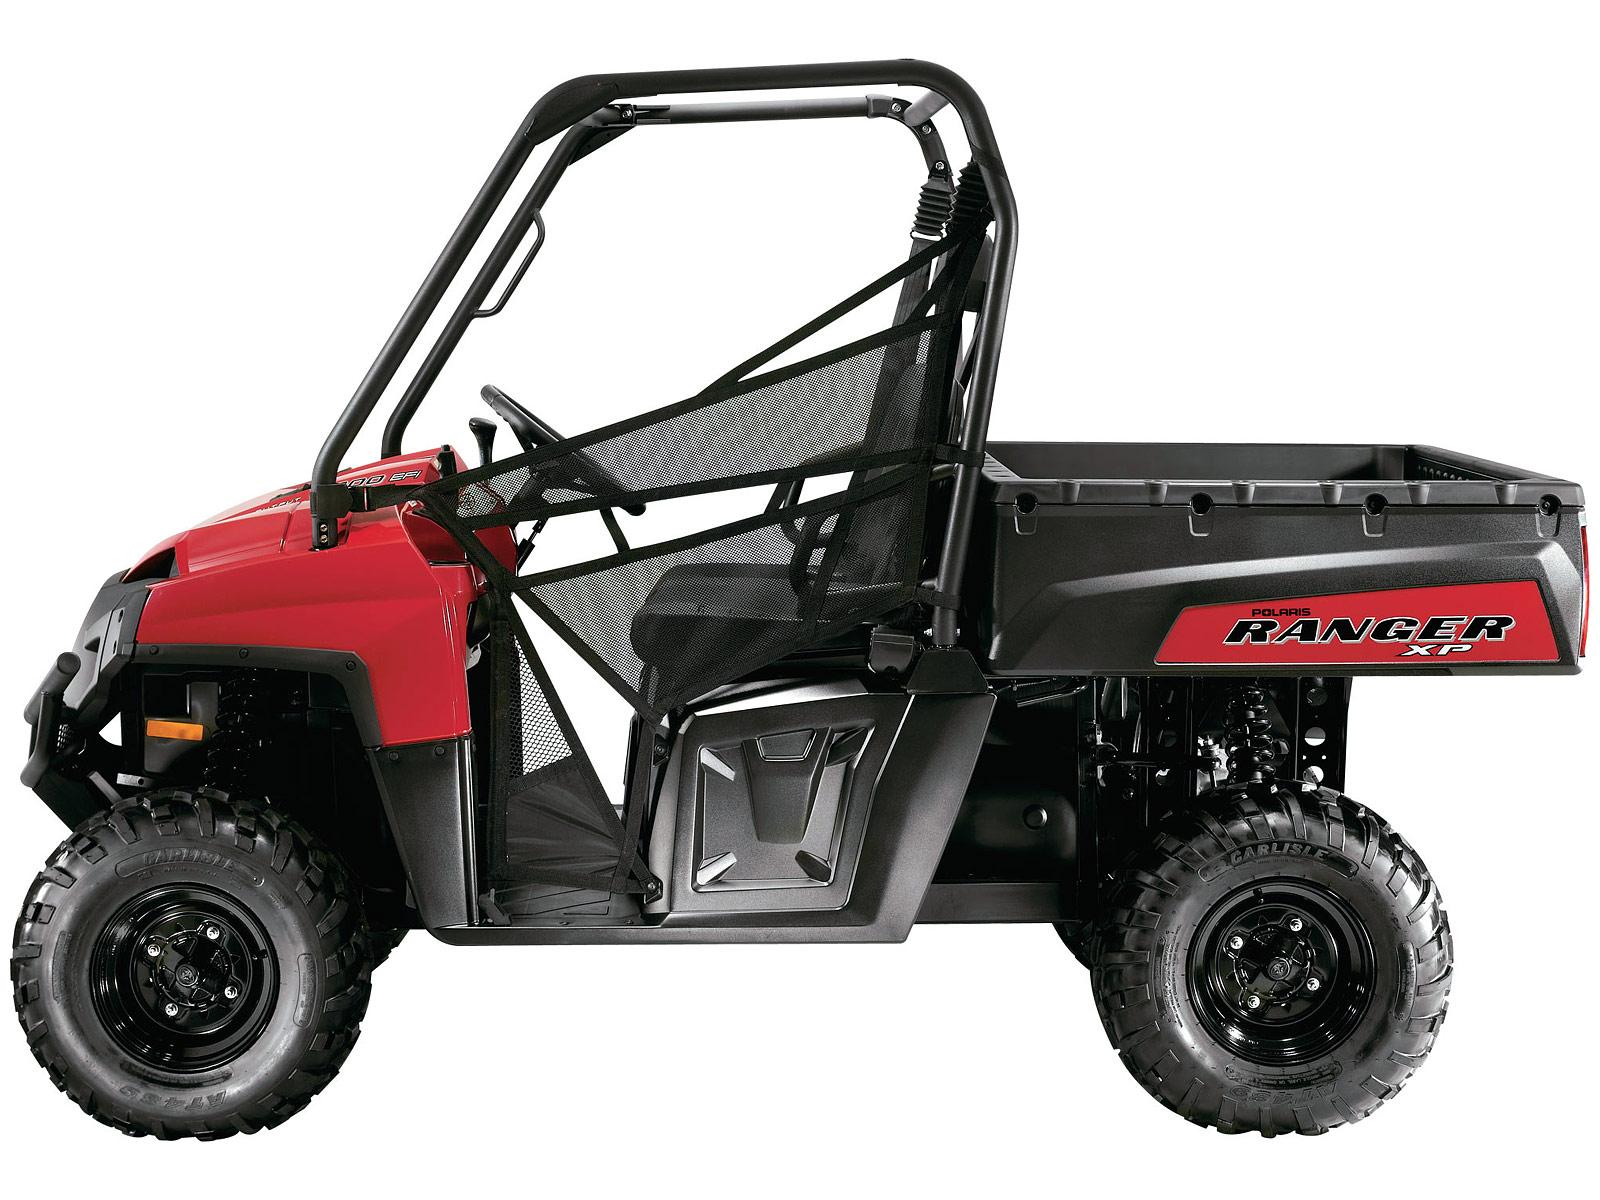 2013 Polaris Ranger 900 Light Bar Wiring Diagram Auto Electrical Xp Harness Get Free